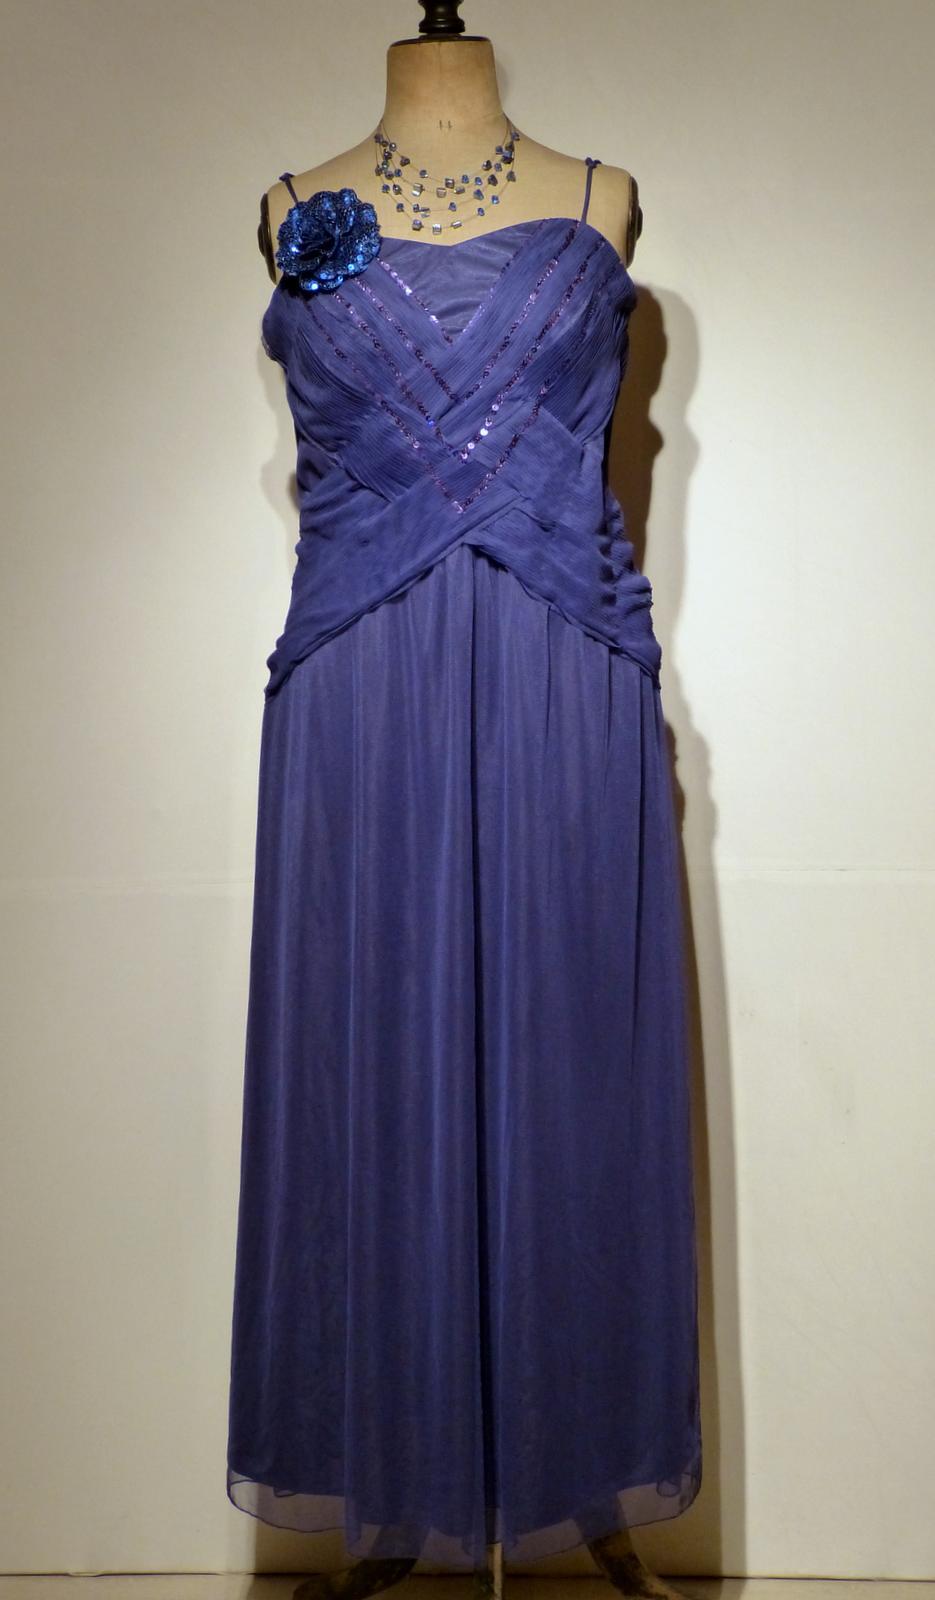 top robes blog robe de soiree grande taille location. Black Bedroom Furniture Sets. Home Design Ideas